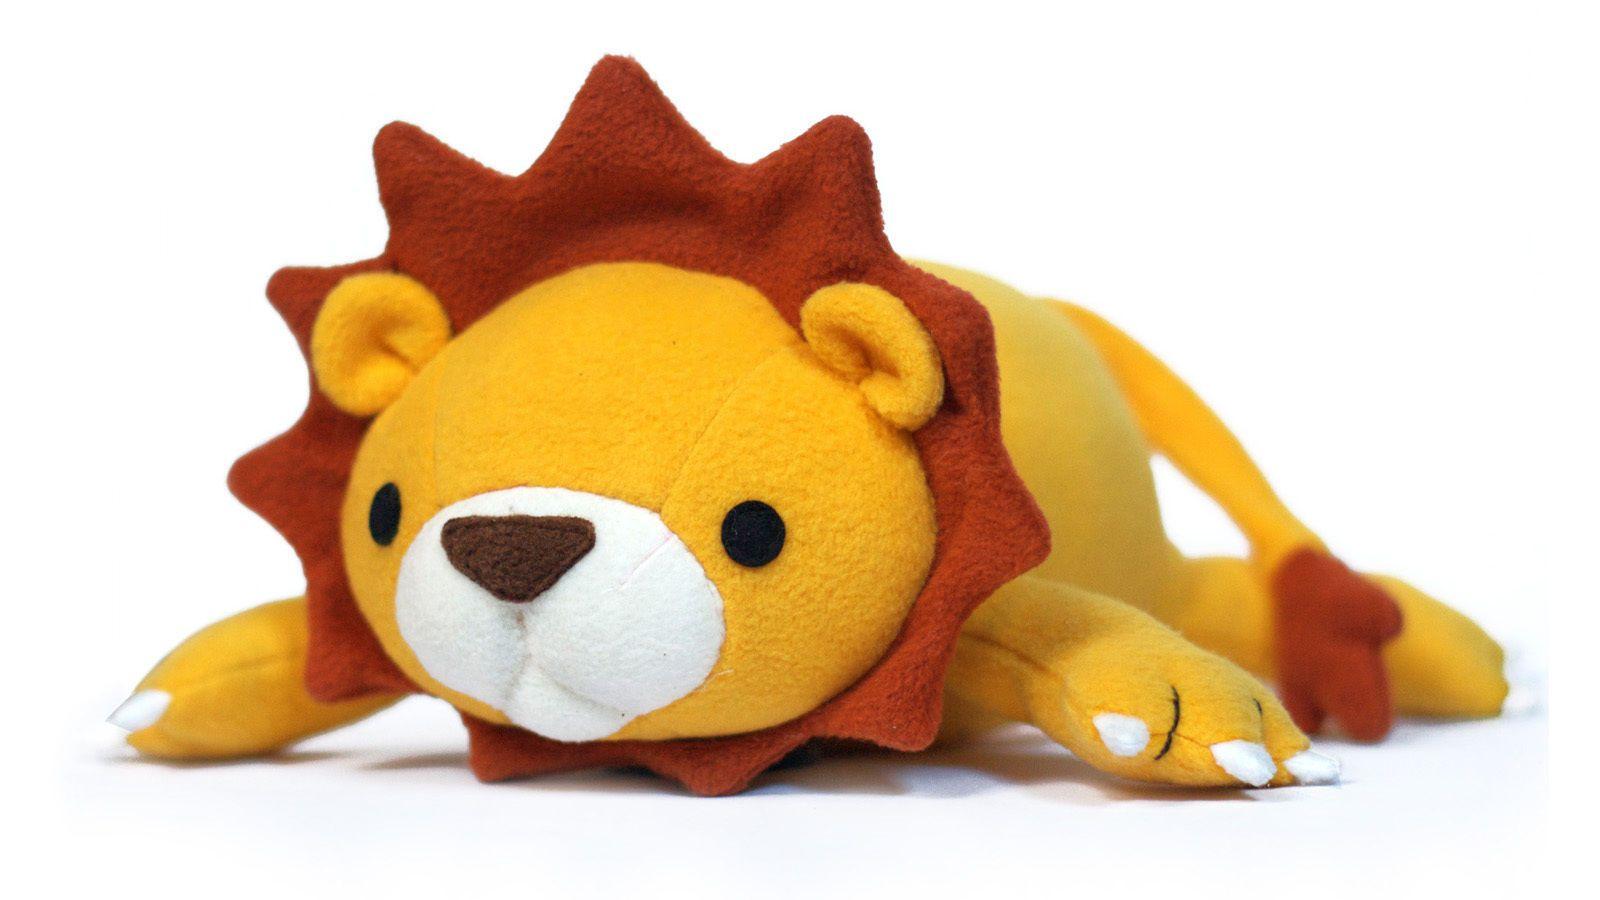 Lucky der Löwe Nähanleitung und Schnittmuster Stofftier | Pinterest ...